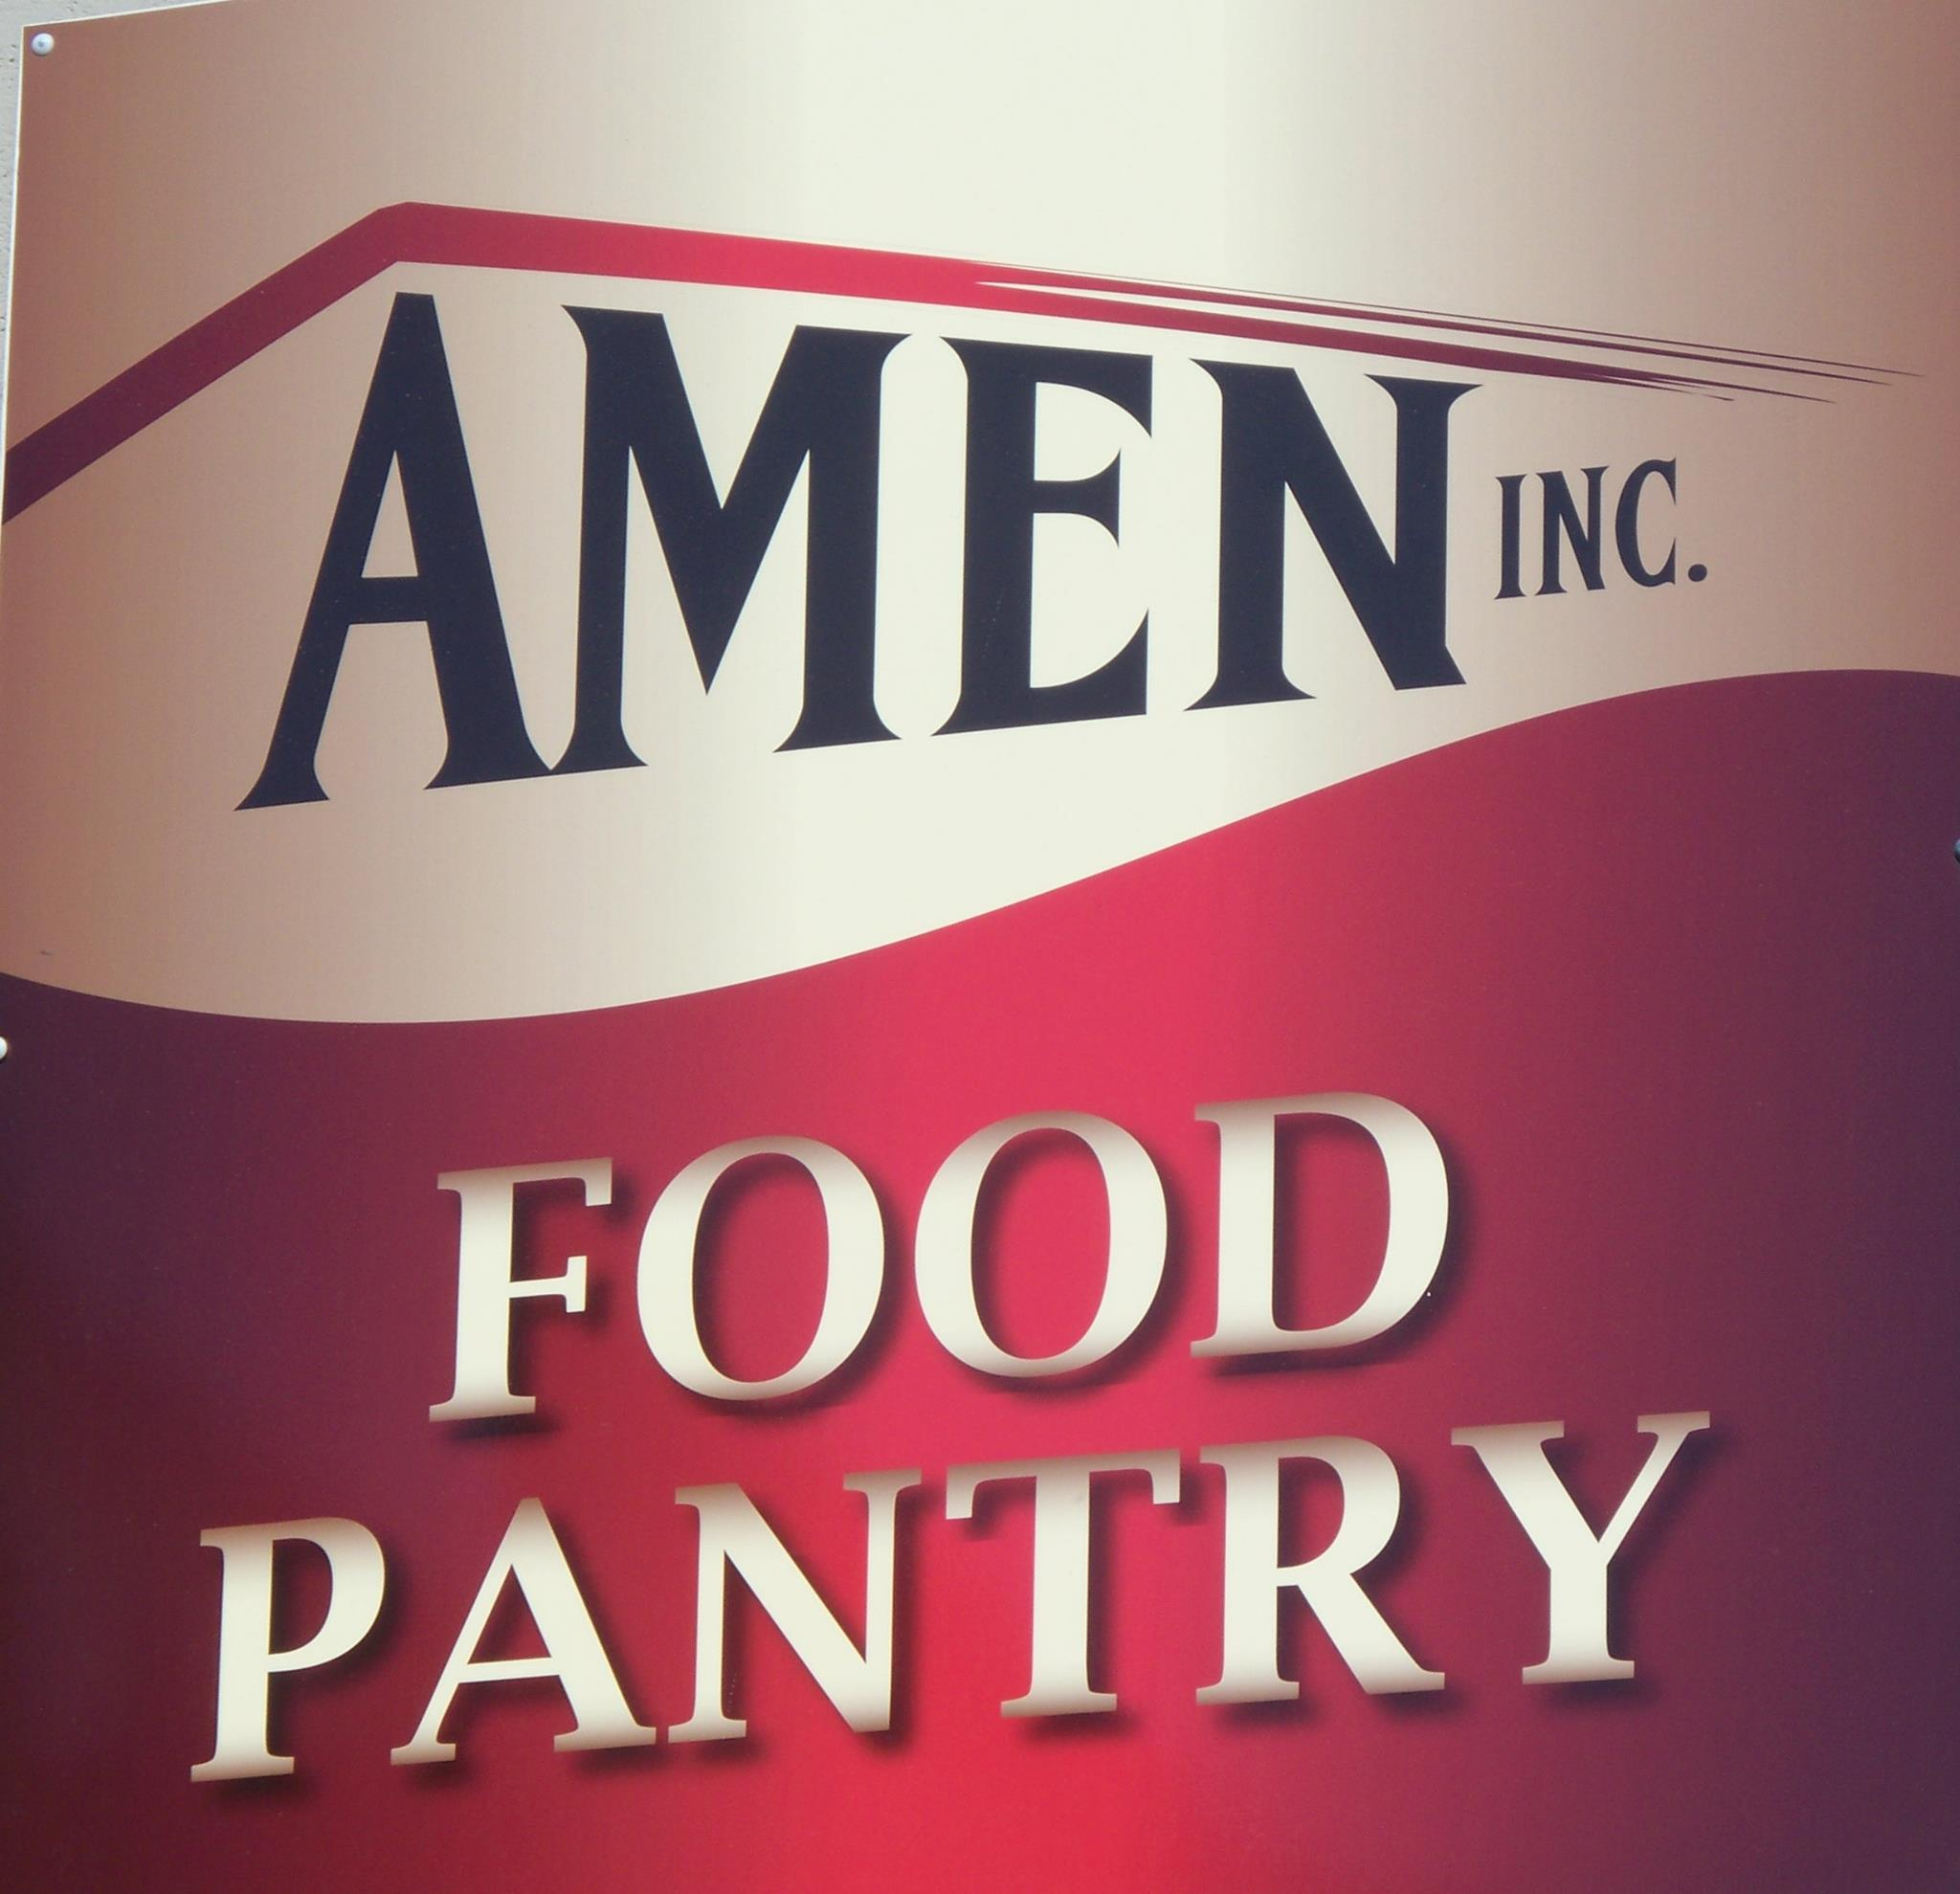 Amen Food Pantry